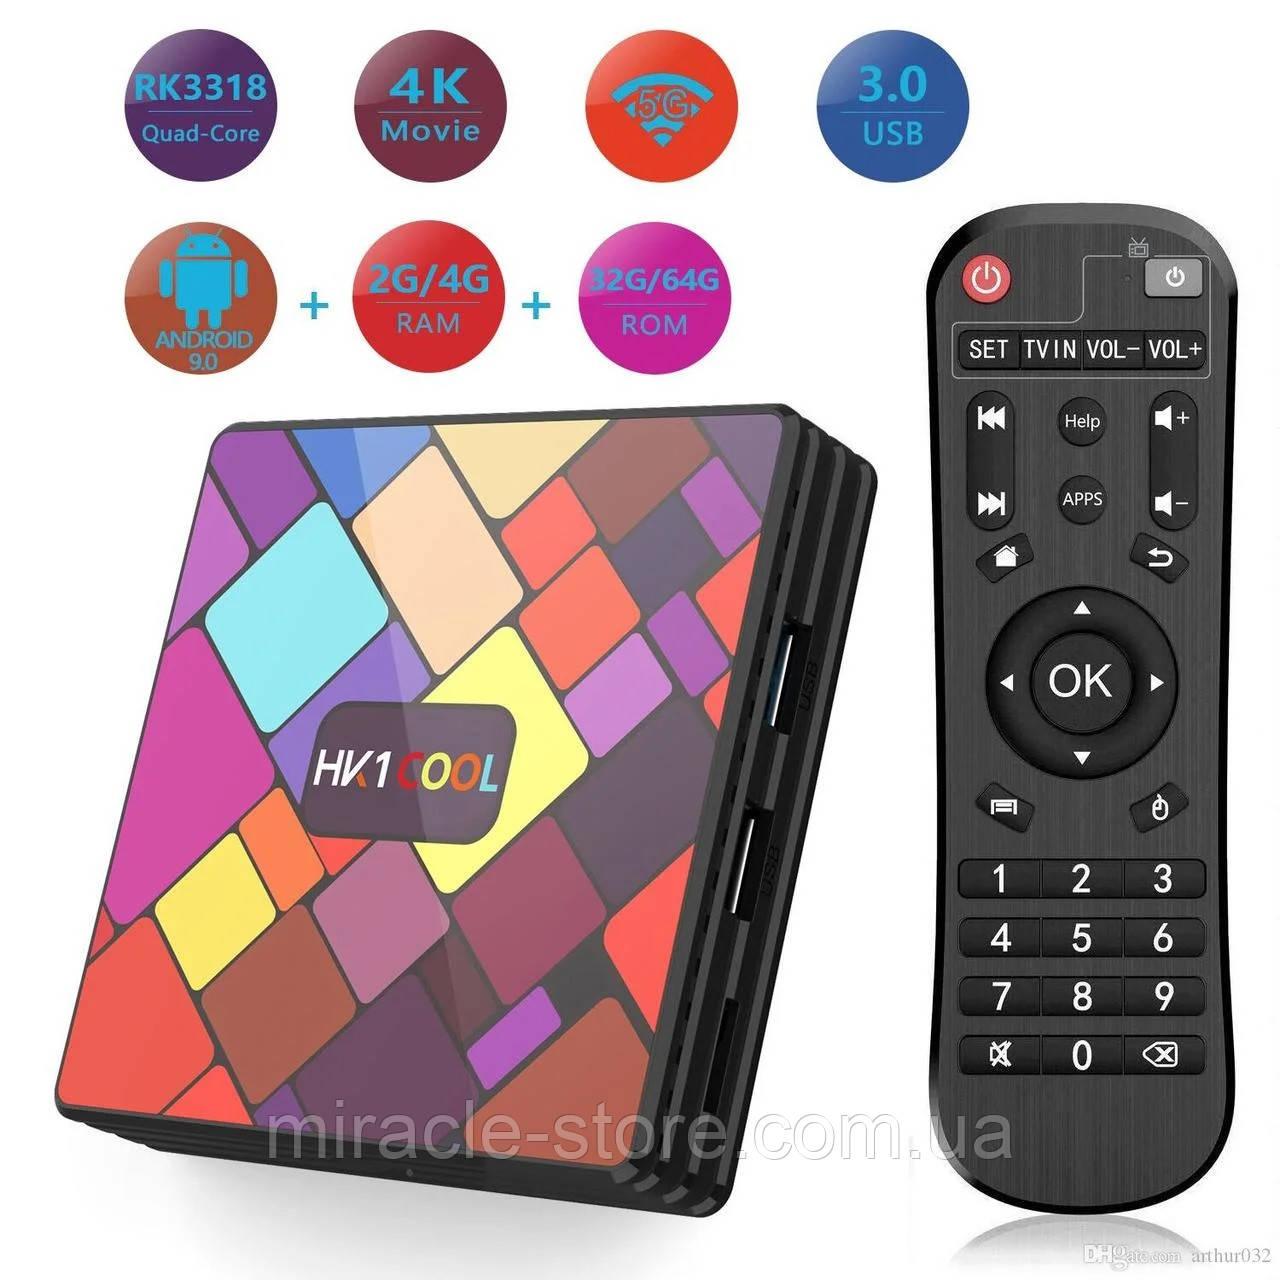 Смарт приставка Smart TV HK1 Cool 4GB/32GB Smart TV Android 9.0